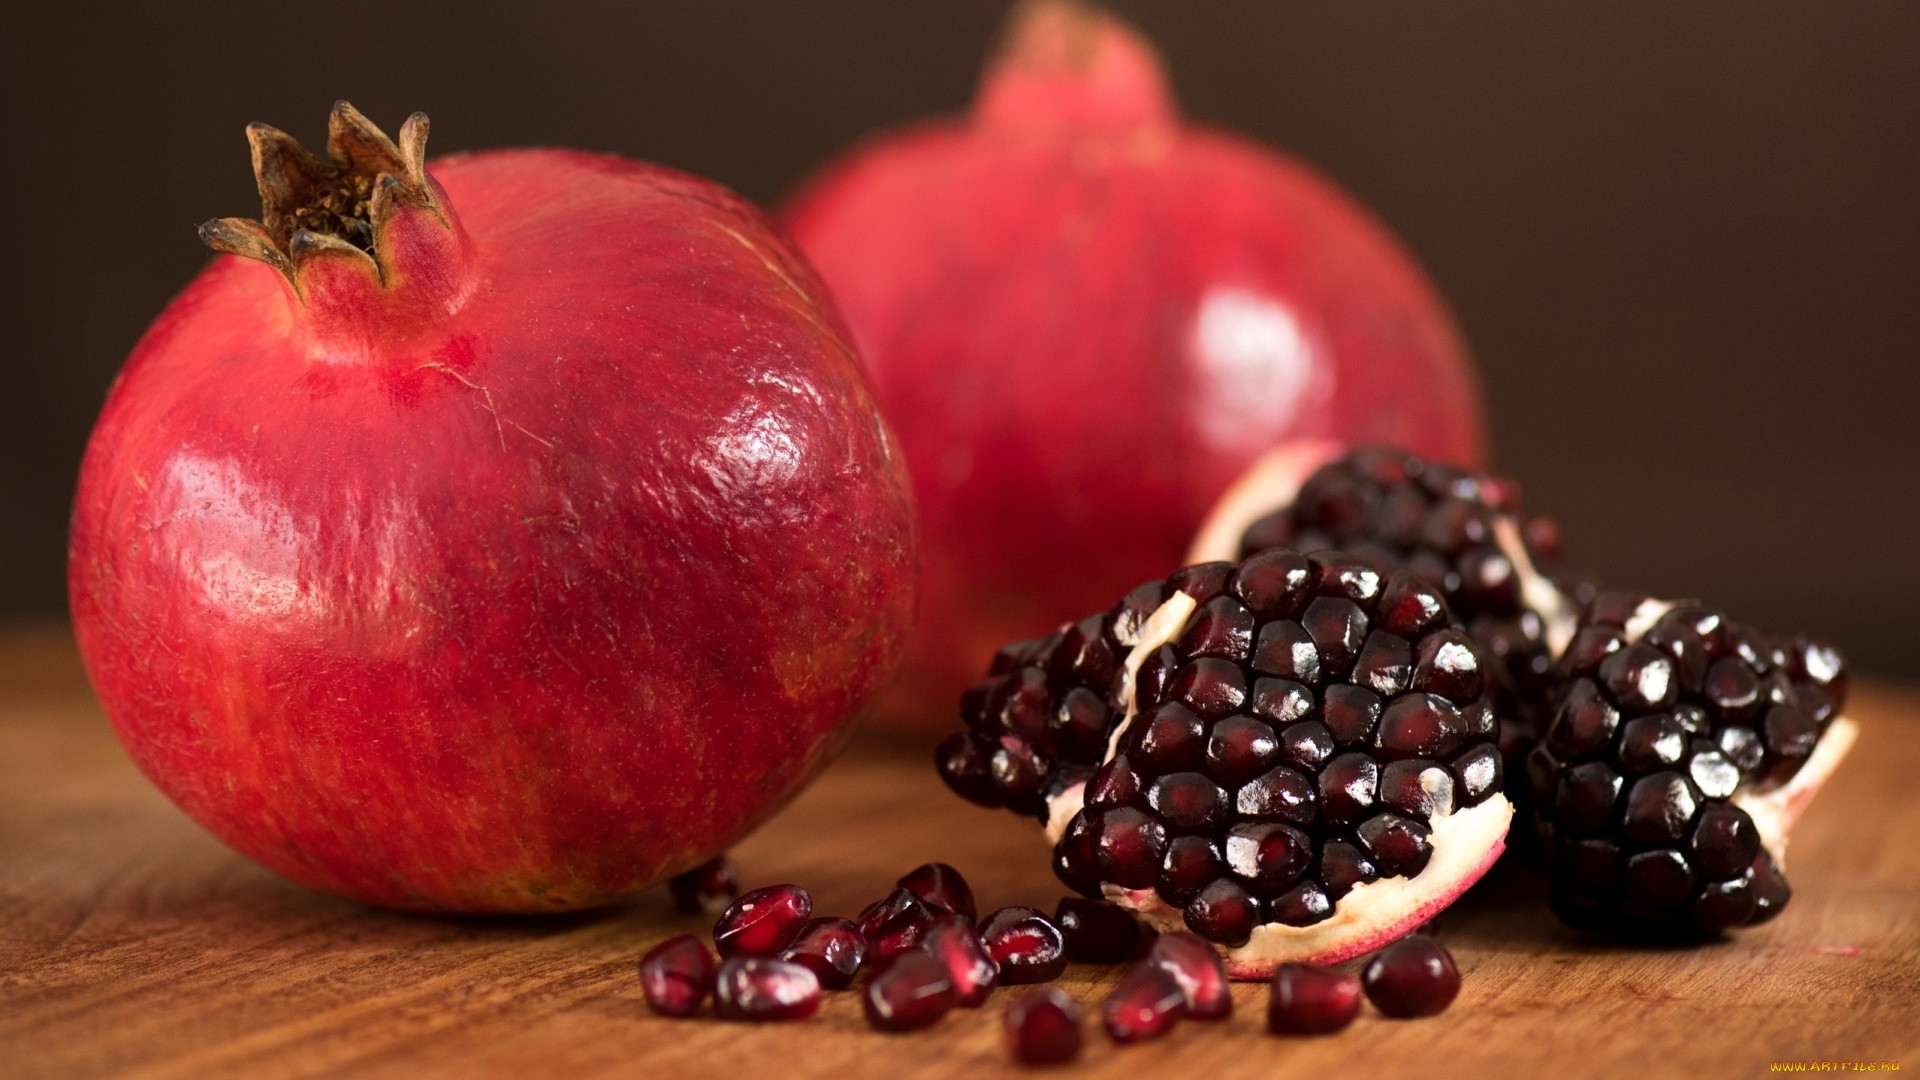 Pomegranate wallpaper image hd